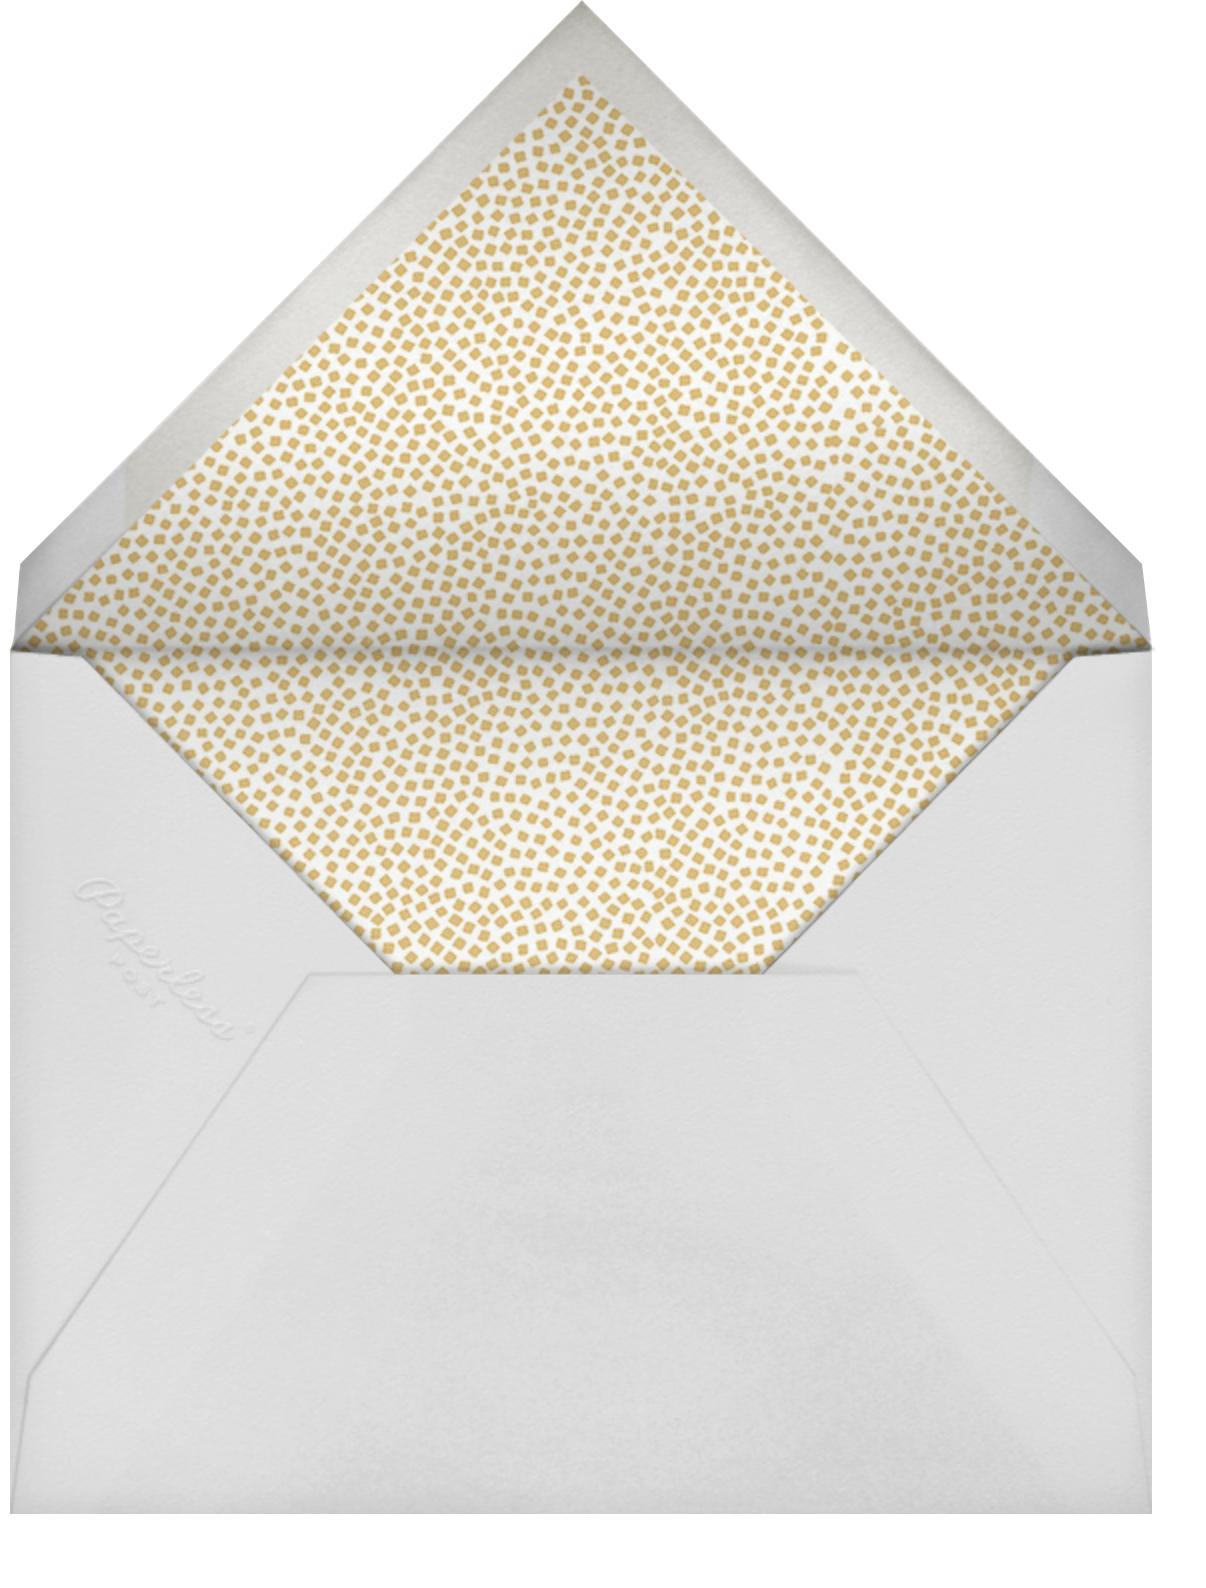 Tempest  - Kelly Wearstler - Reception - envelope back